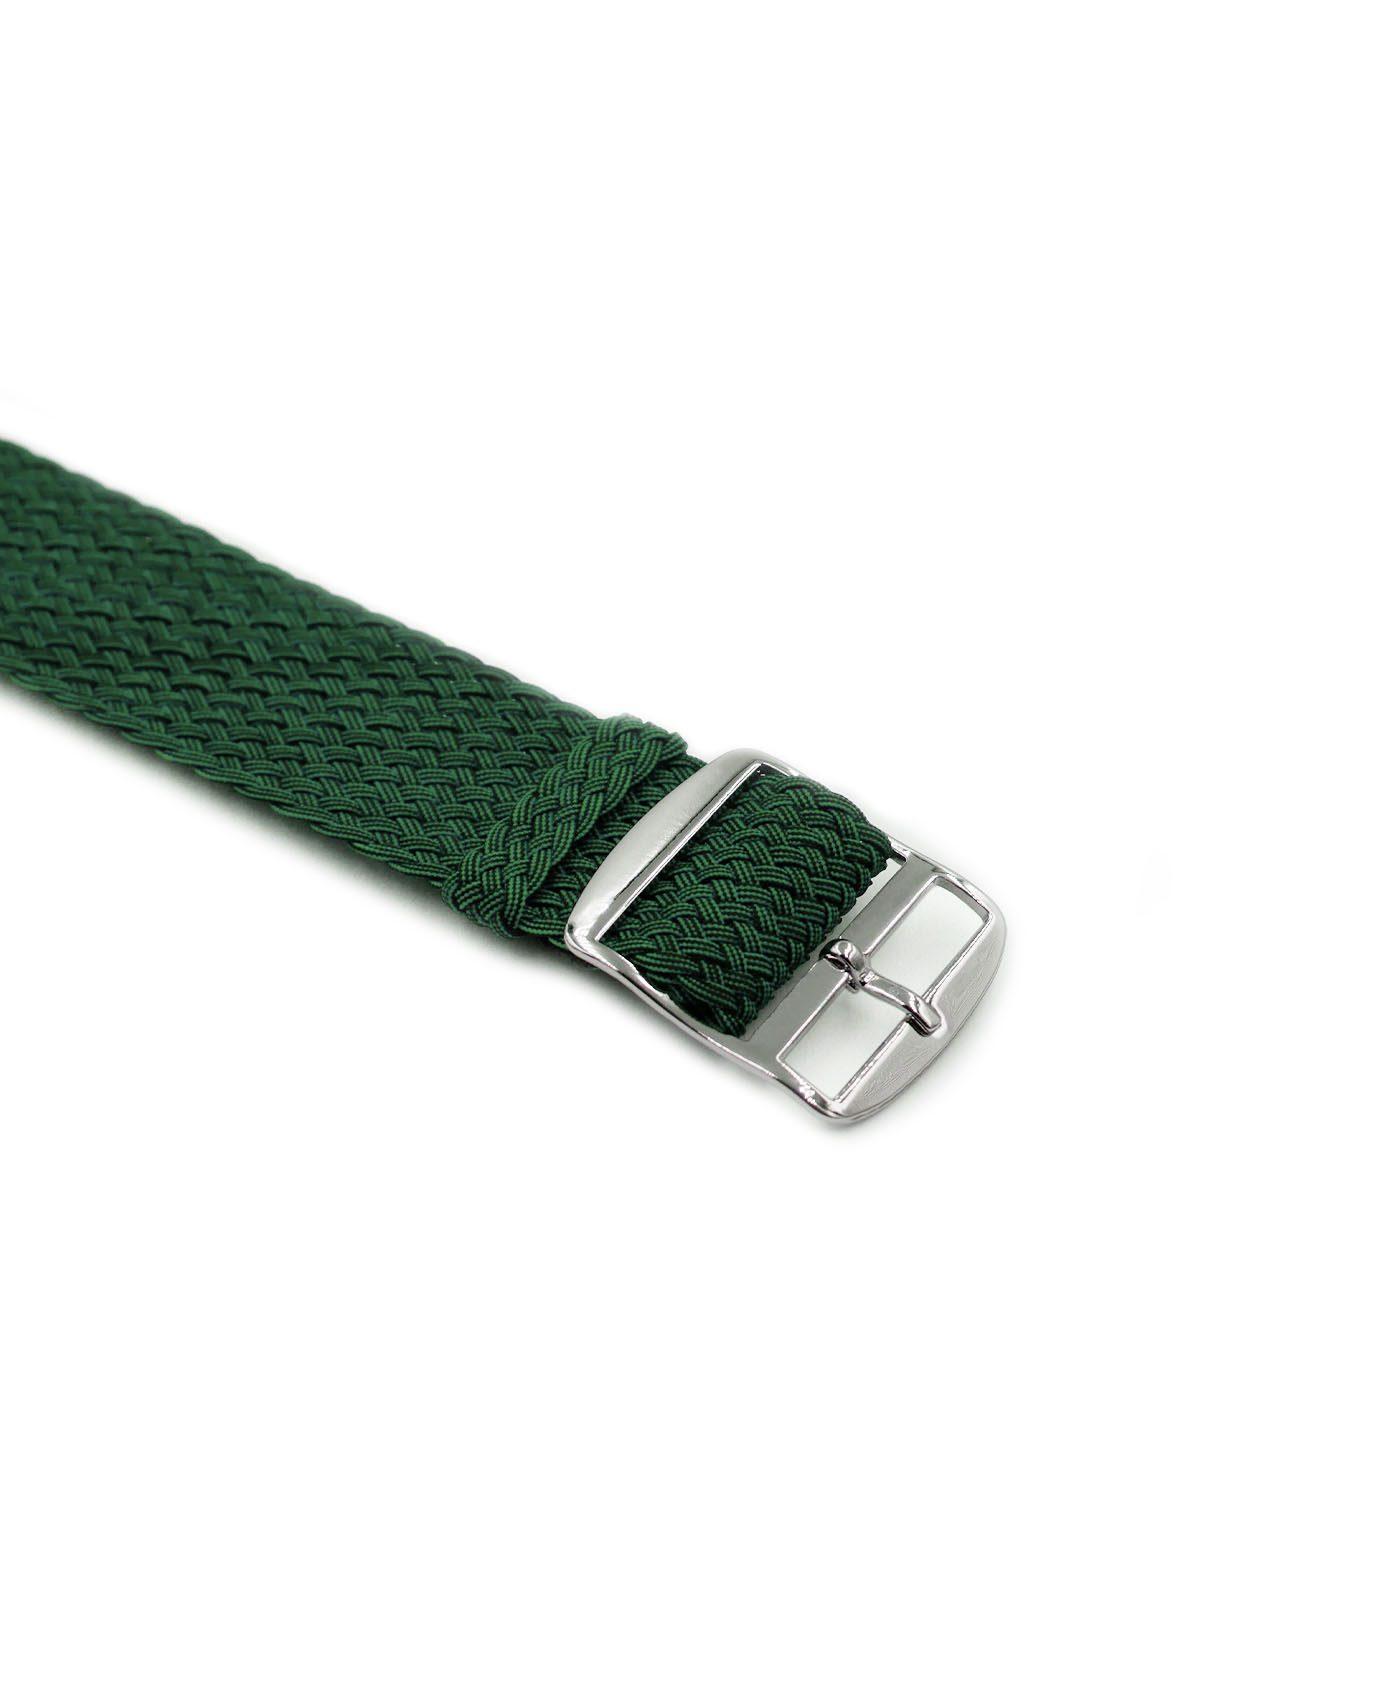 Watchbandit Premium Perlon Watch strap green buckle